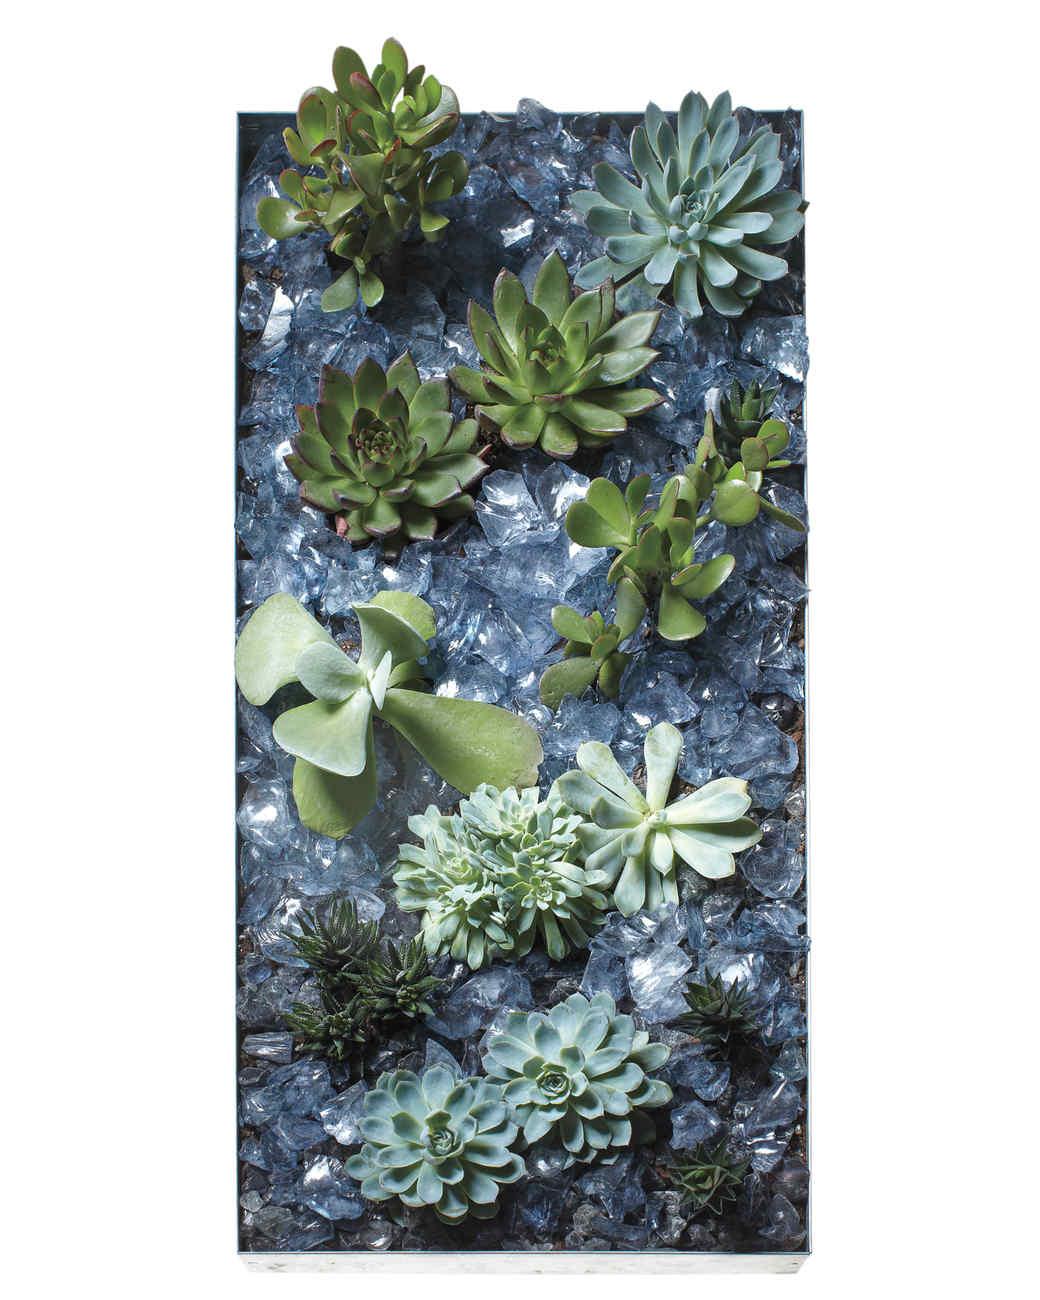 rock-gardens-mld108212.jpg